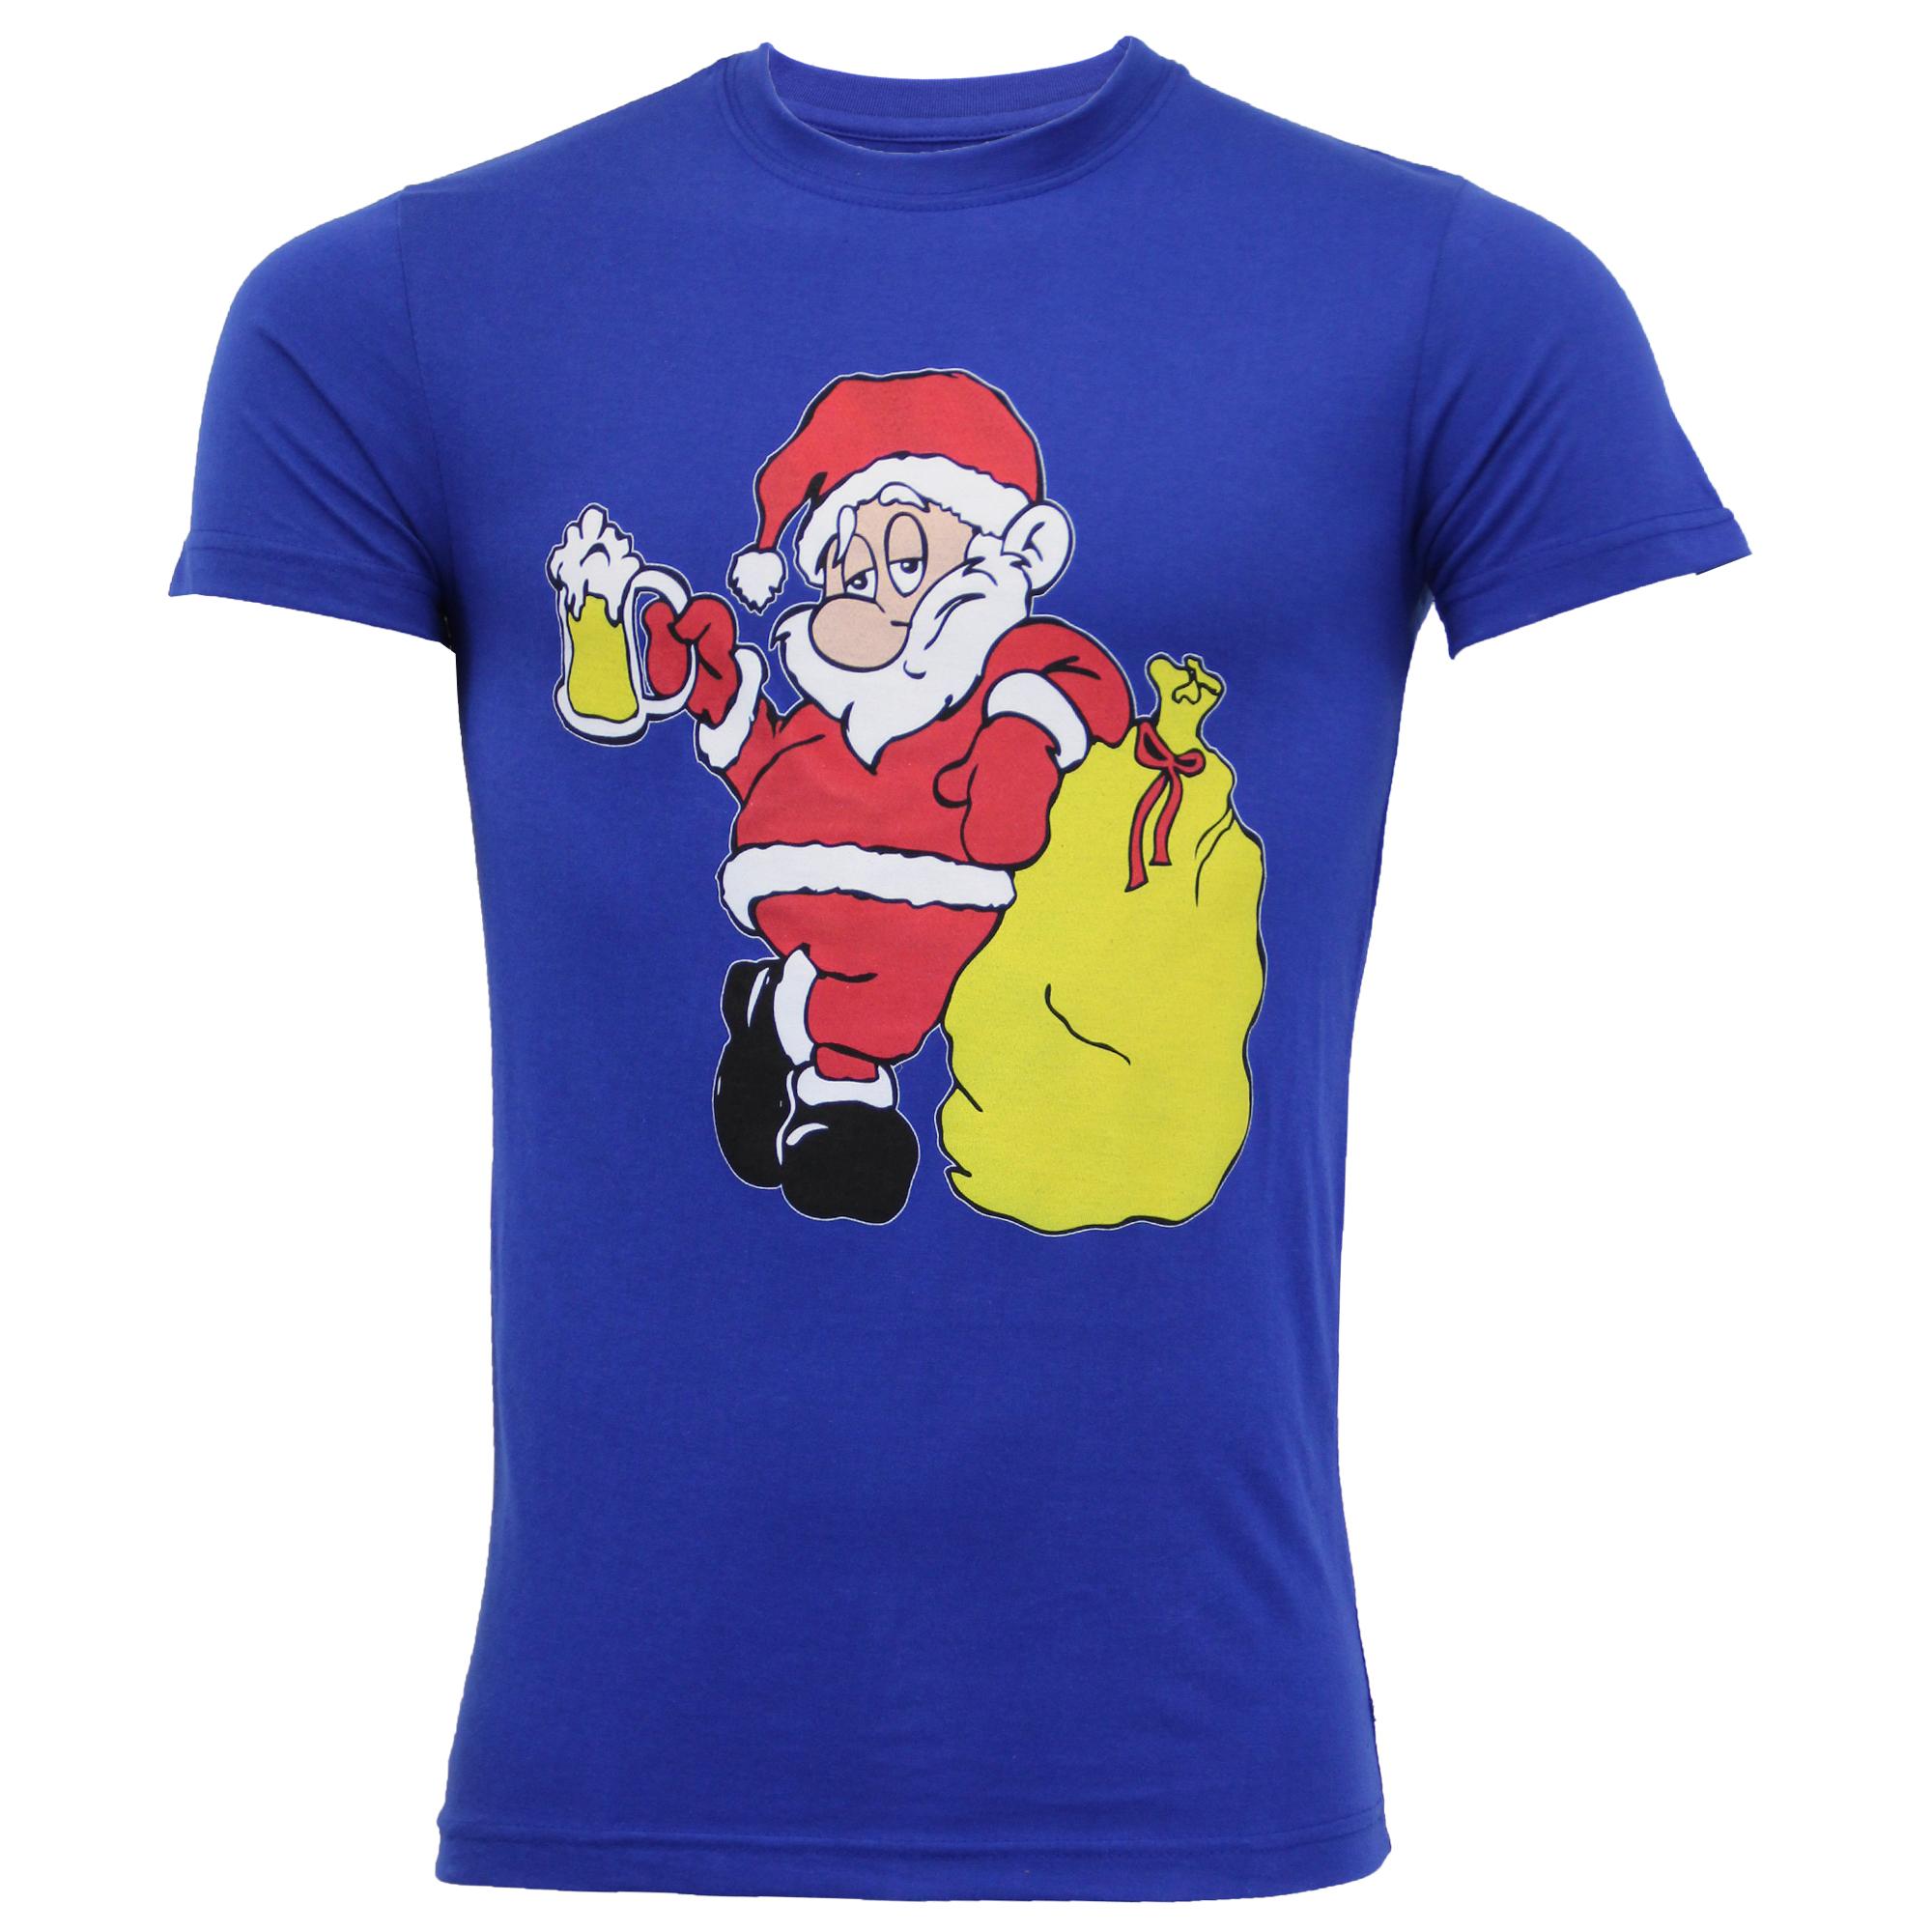 Mens Christmas T Shirt Xmas Santa Claus Novelty Cotton Fashion Festive Top New